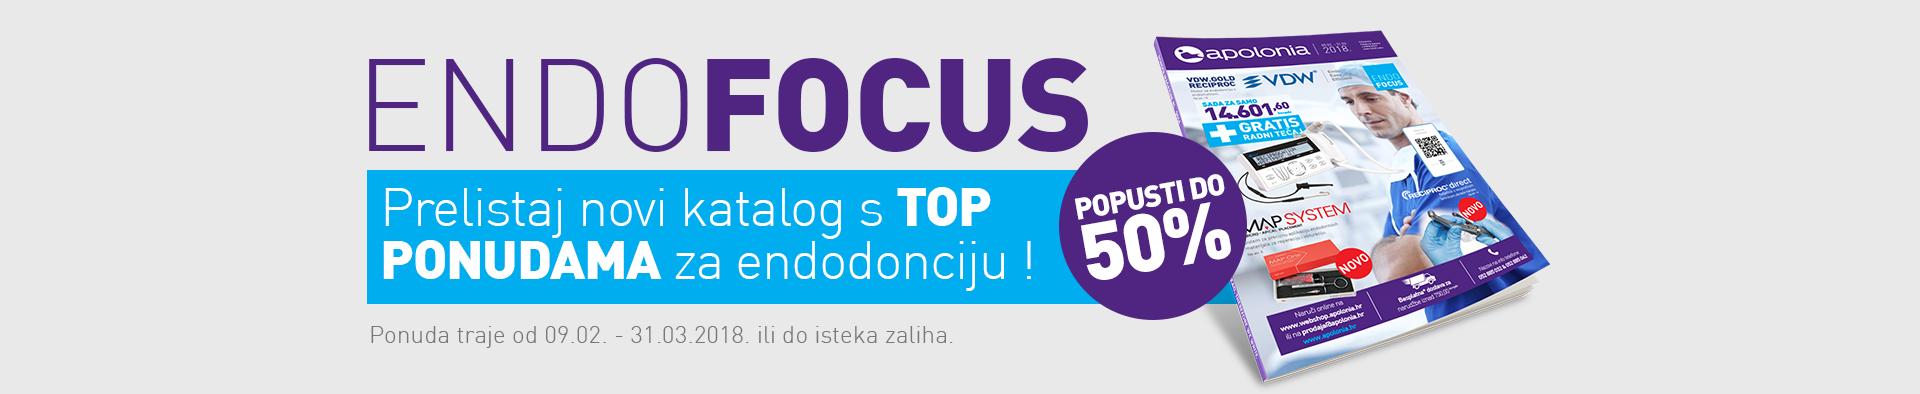 apolonia_endo_focus-02-2018